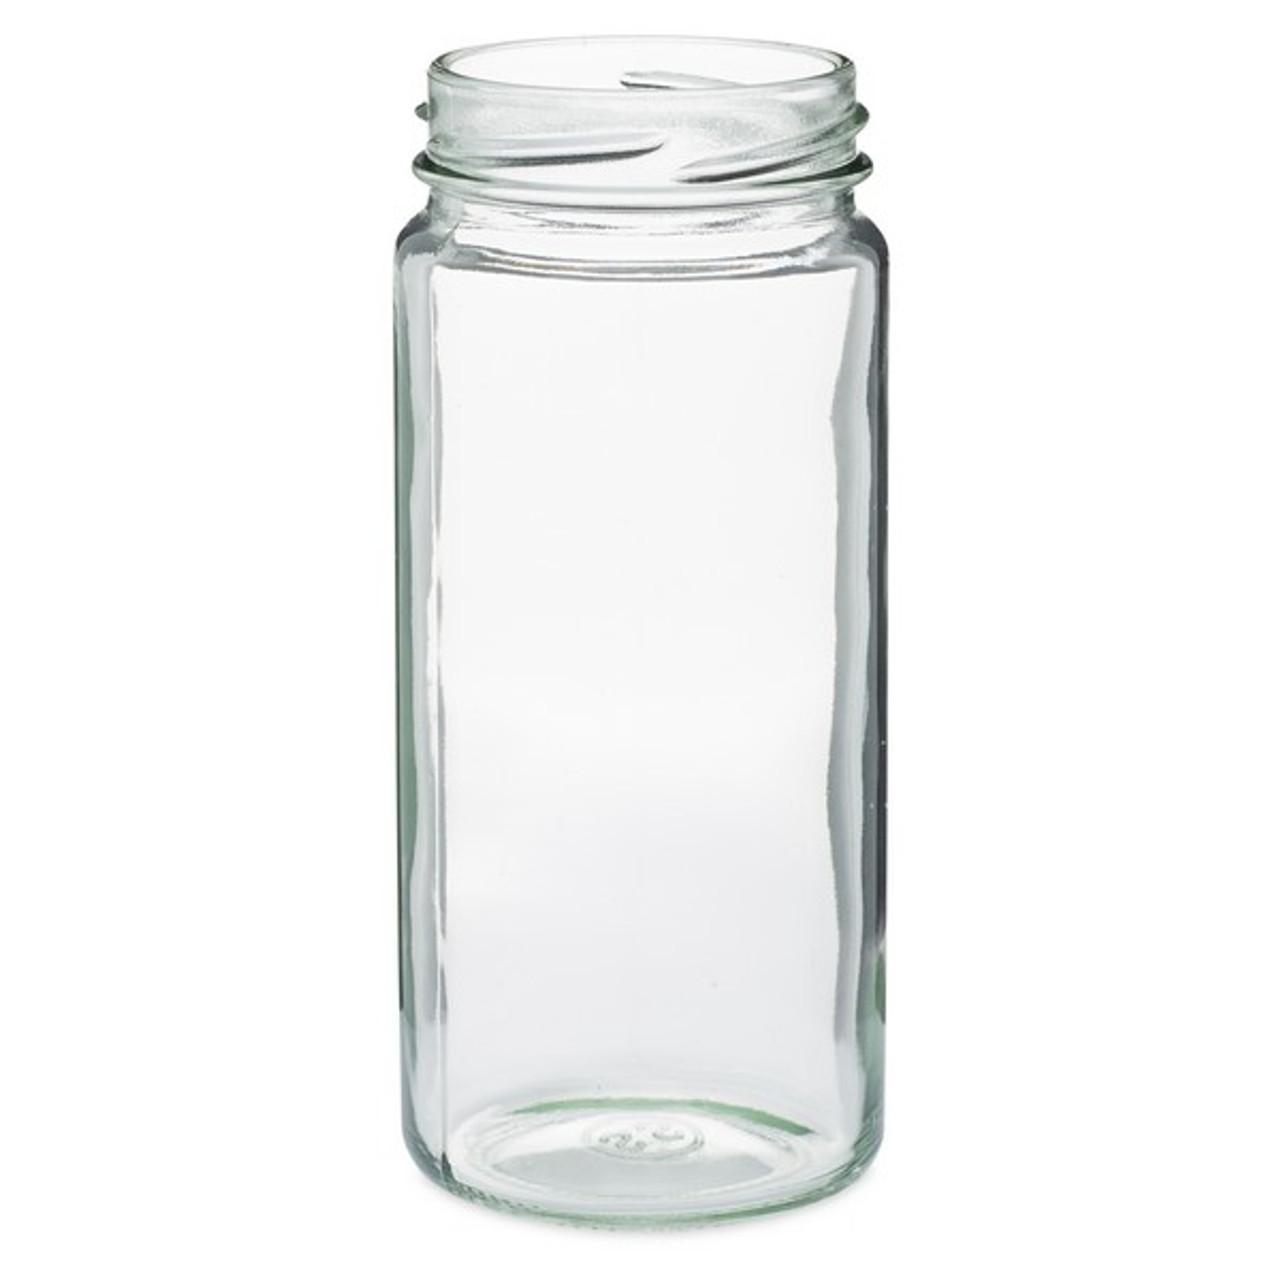 Glass Paragon Jars| Wholesale & Bulk | Berlin Packaging